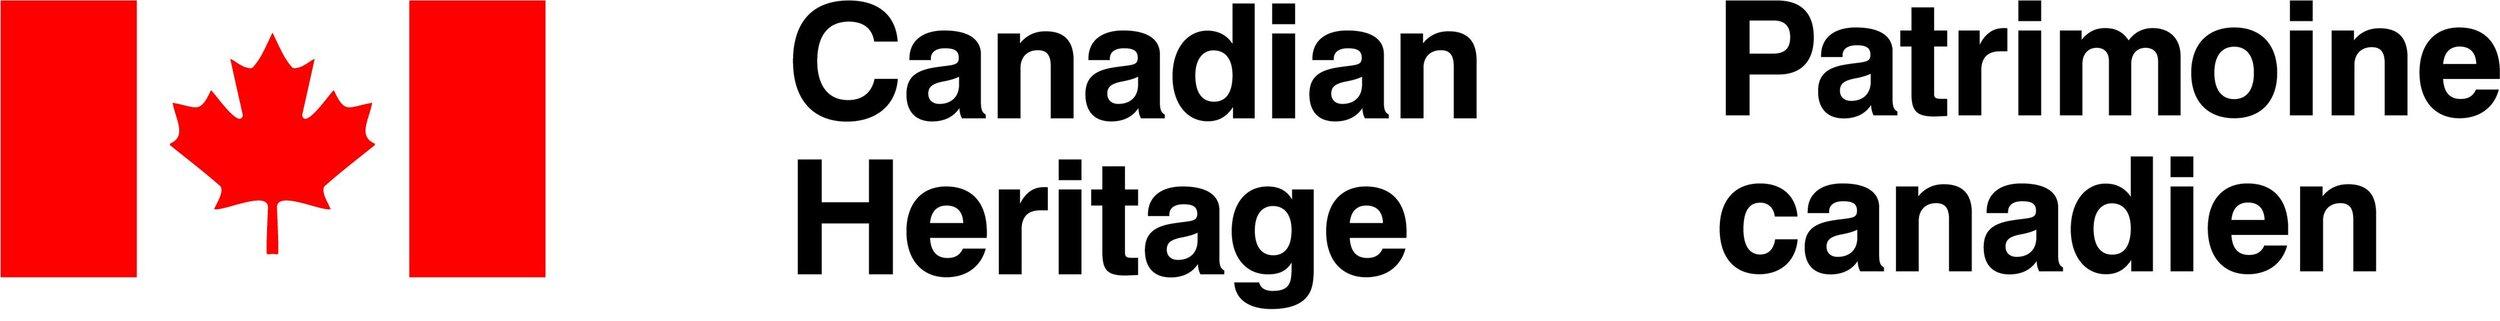 Can heritage logo.jpg